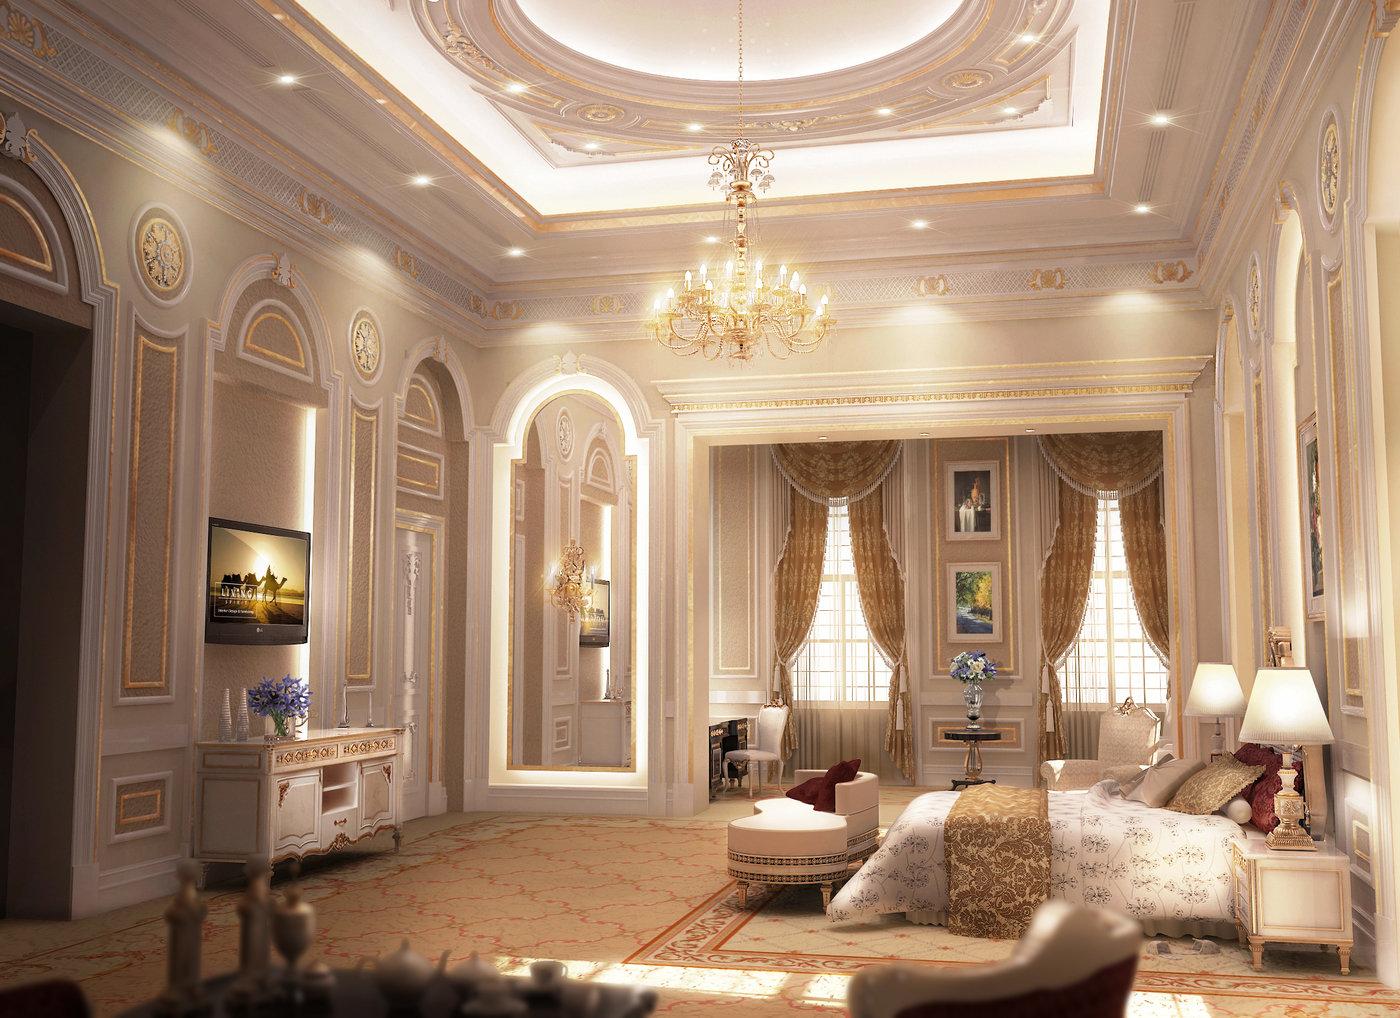 High End Interior Design Concepts By Art Jojo Liban At